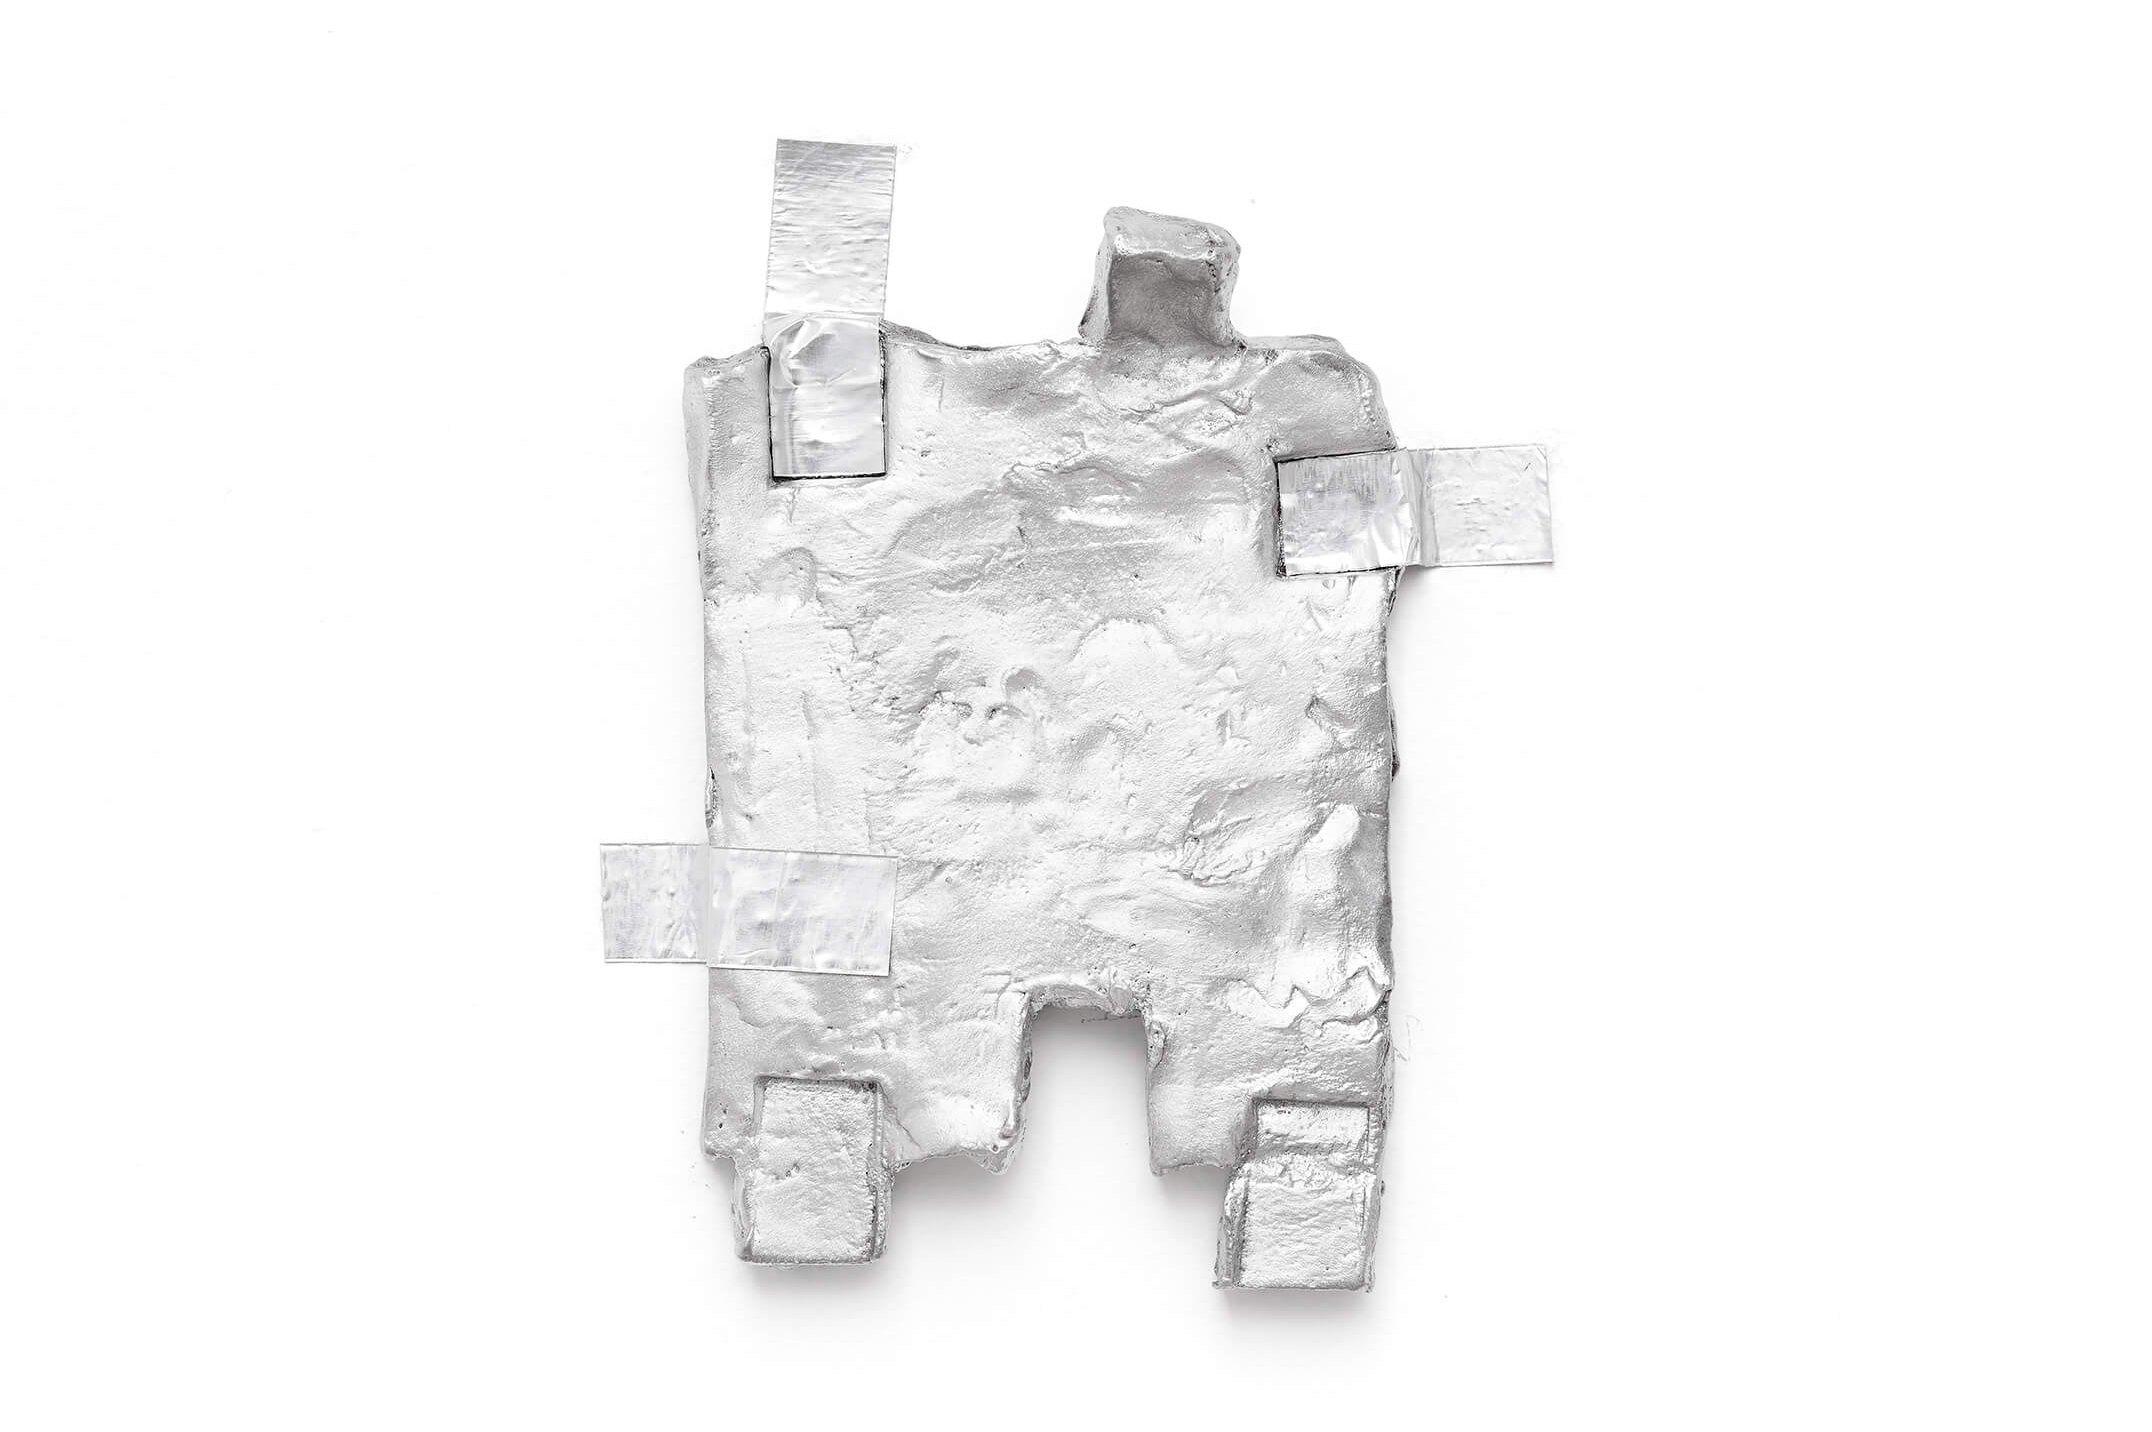 Paulo Monteiro,<em>untitled</em>, 2015, aluminum, 25 × 22 cm - Mendes Wood DM